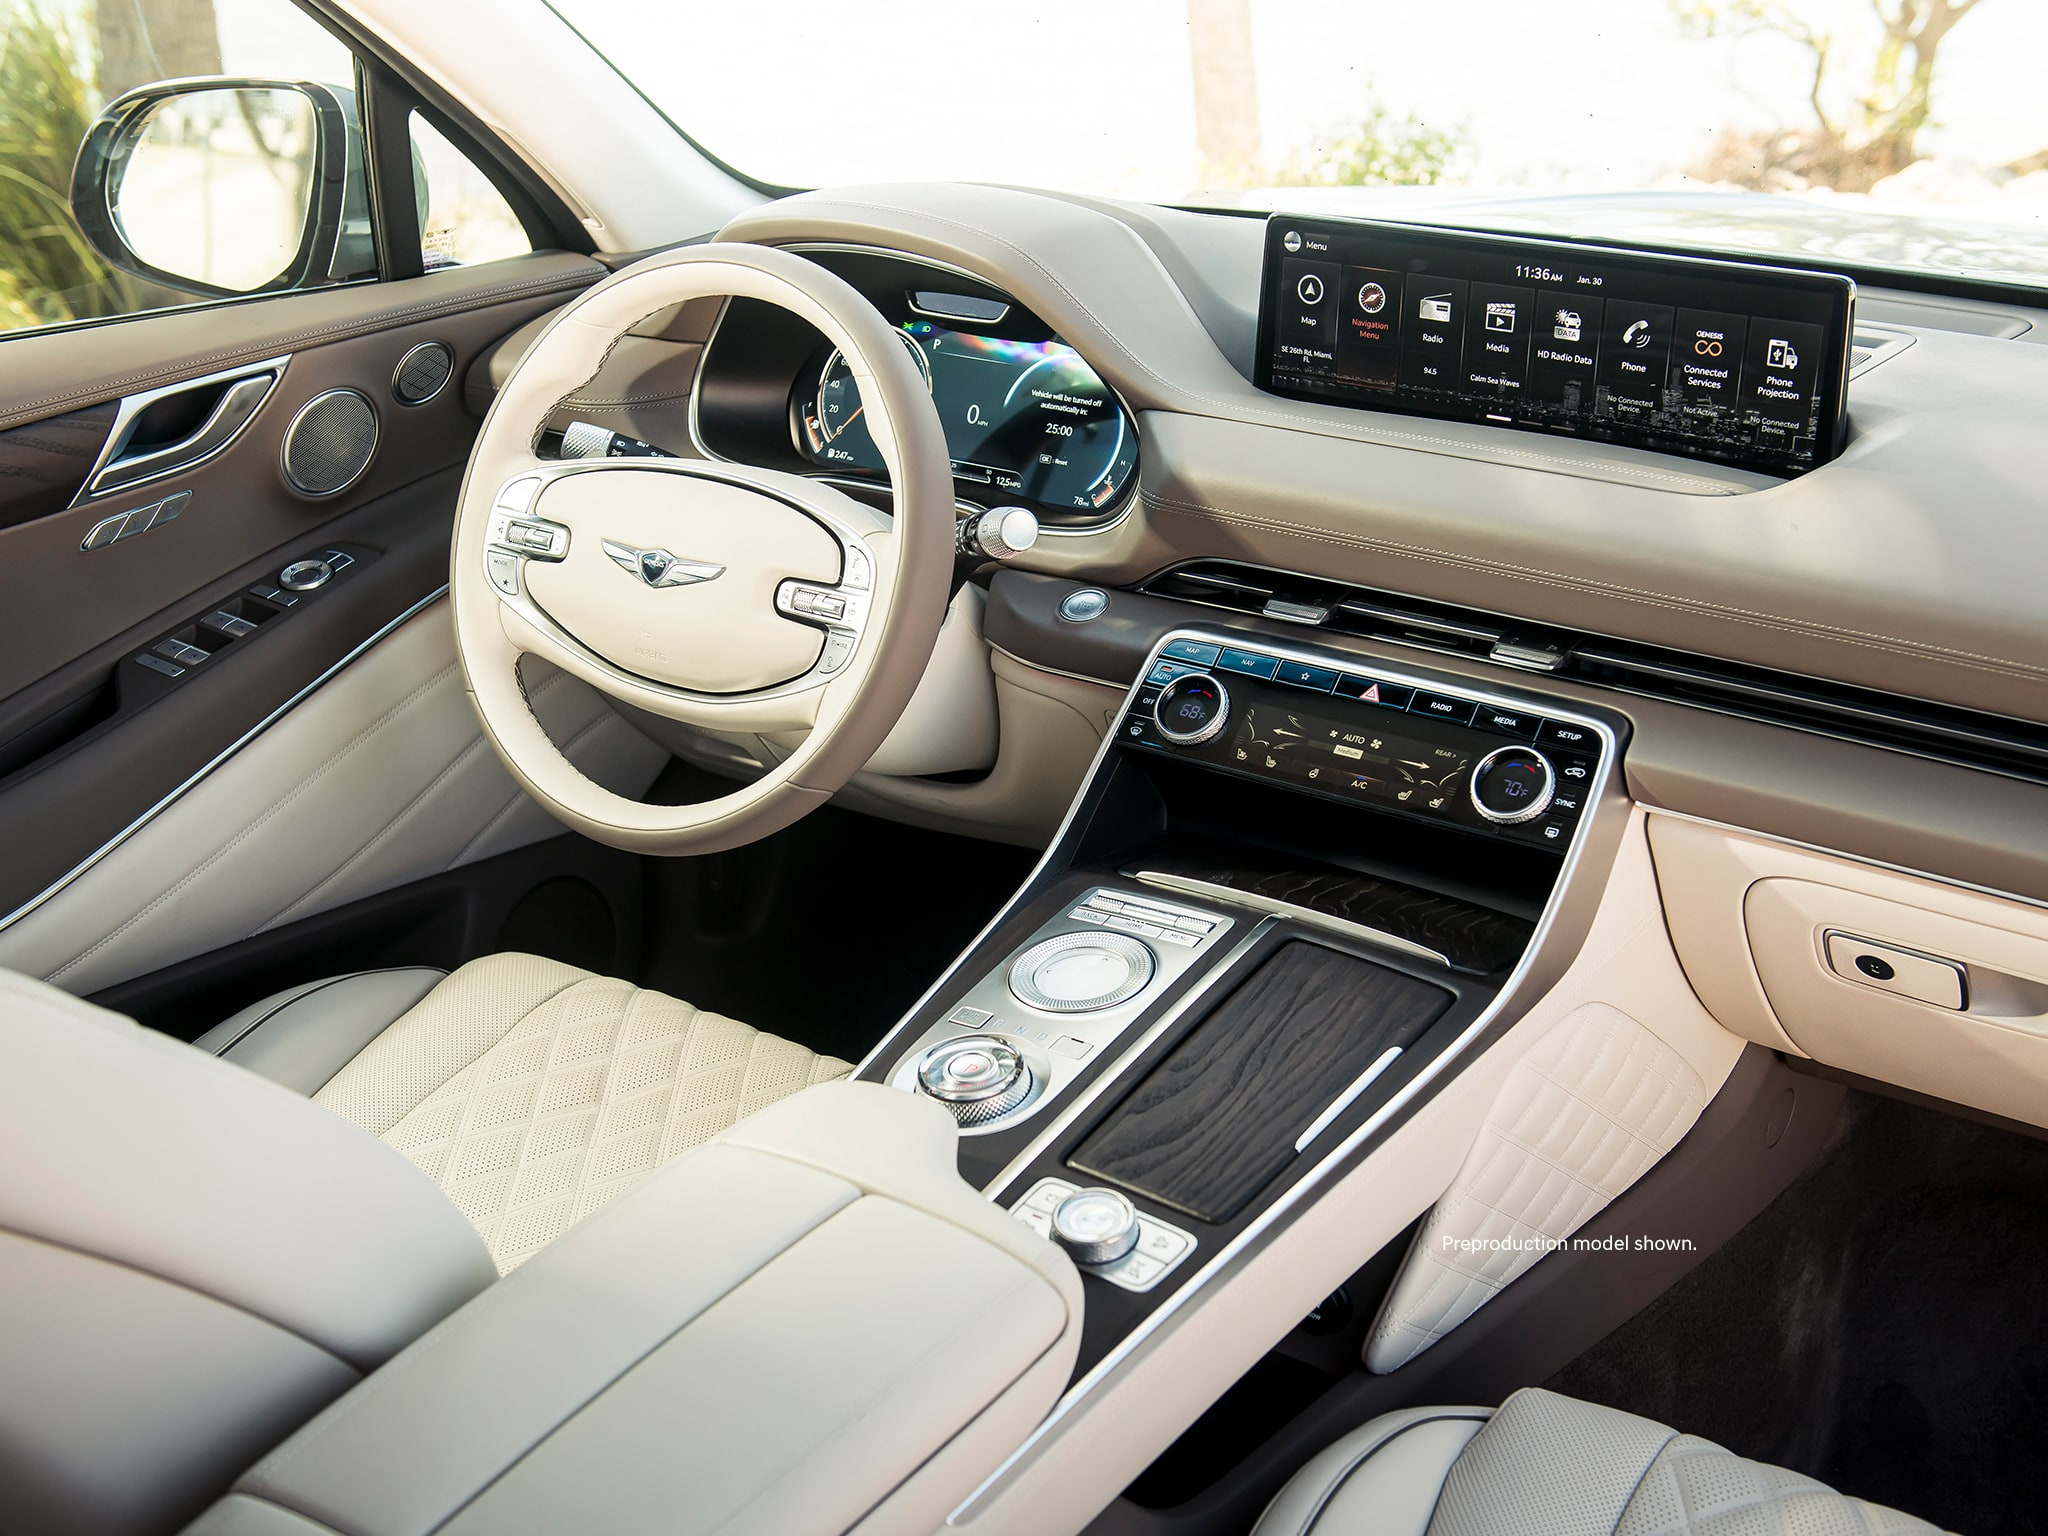 2021 Genesis Gv80 A Luxury Suv By Genesis